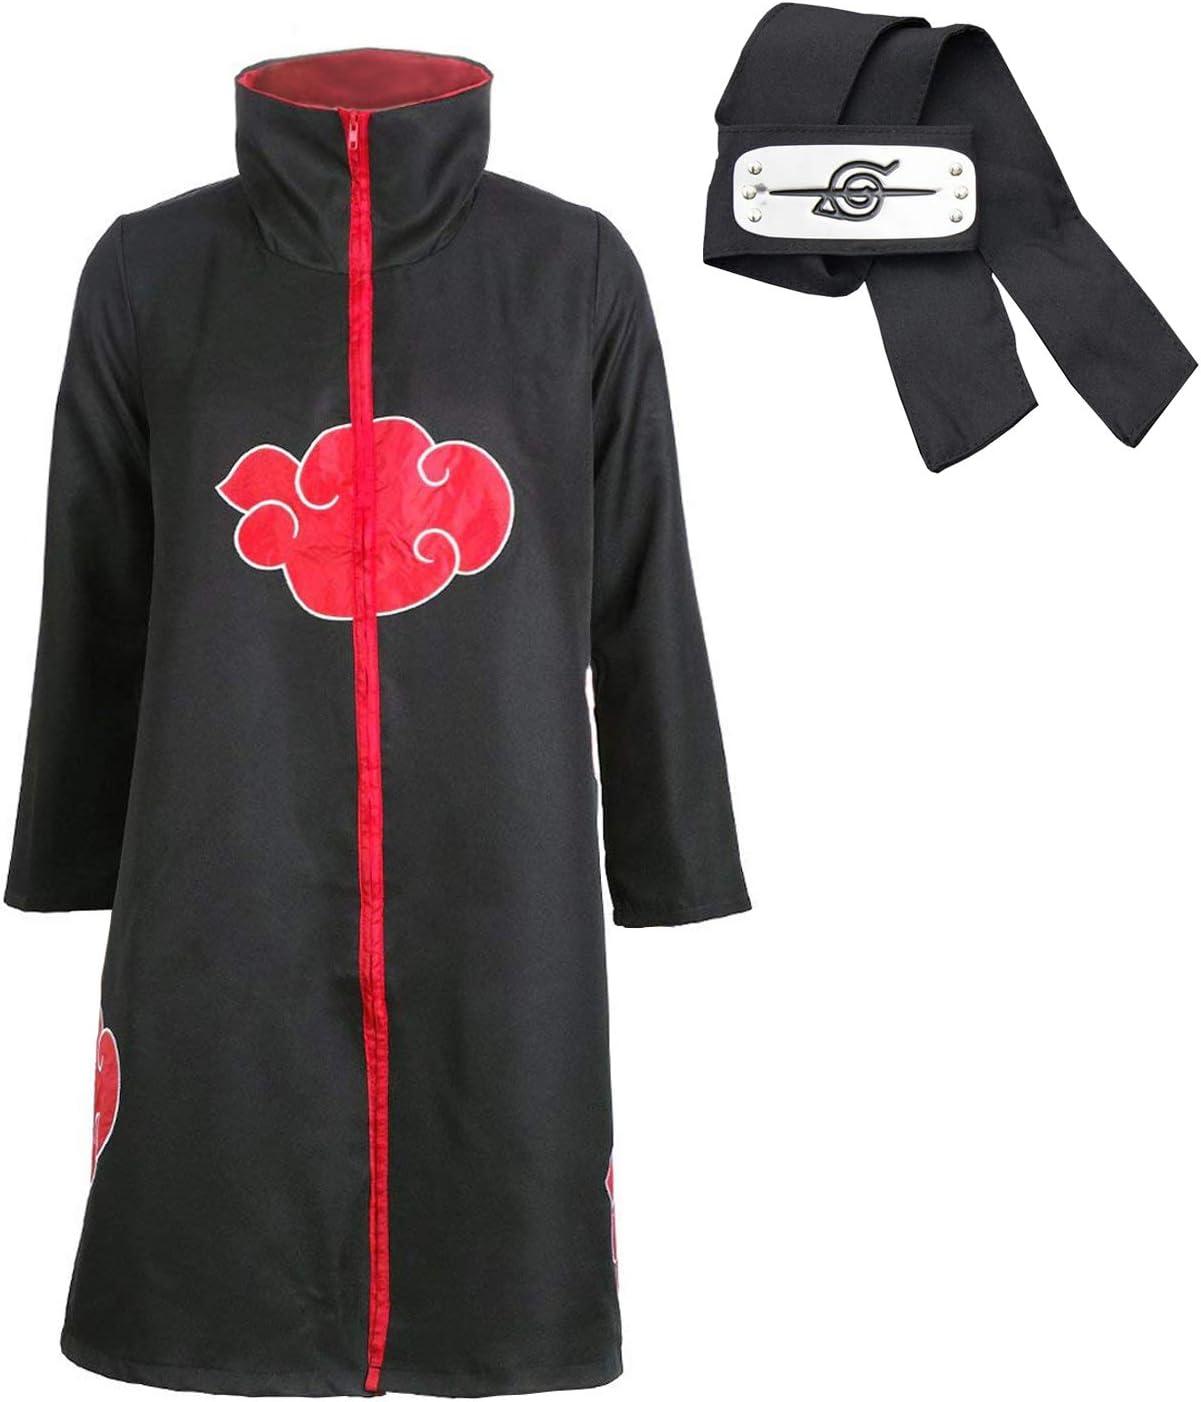 D.F.L Trajes de Akatsuki Cosplay Halloween Capa Larga Cosplay de los Akatsukis Itachi Vestido Akatsuki Cinta de Cabeza Venda para Cosplay Itachi Uchiha (XXS): Amazon.es: Productos para mascotas